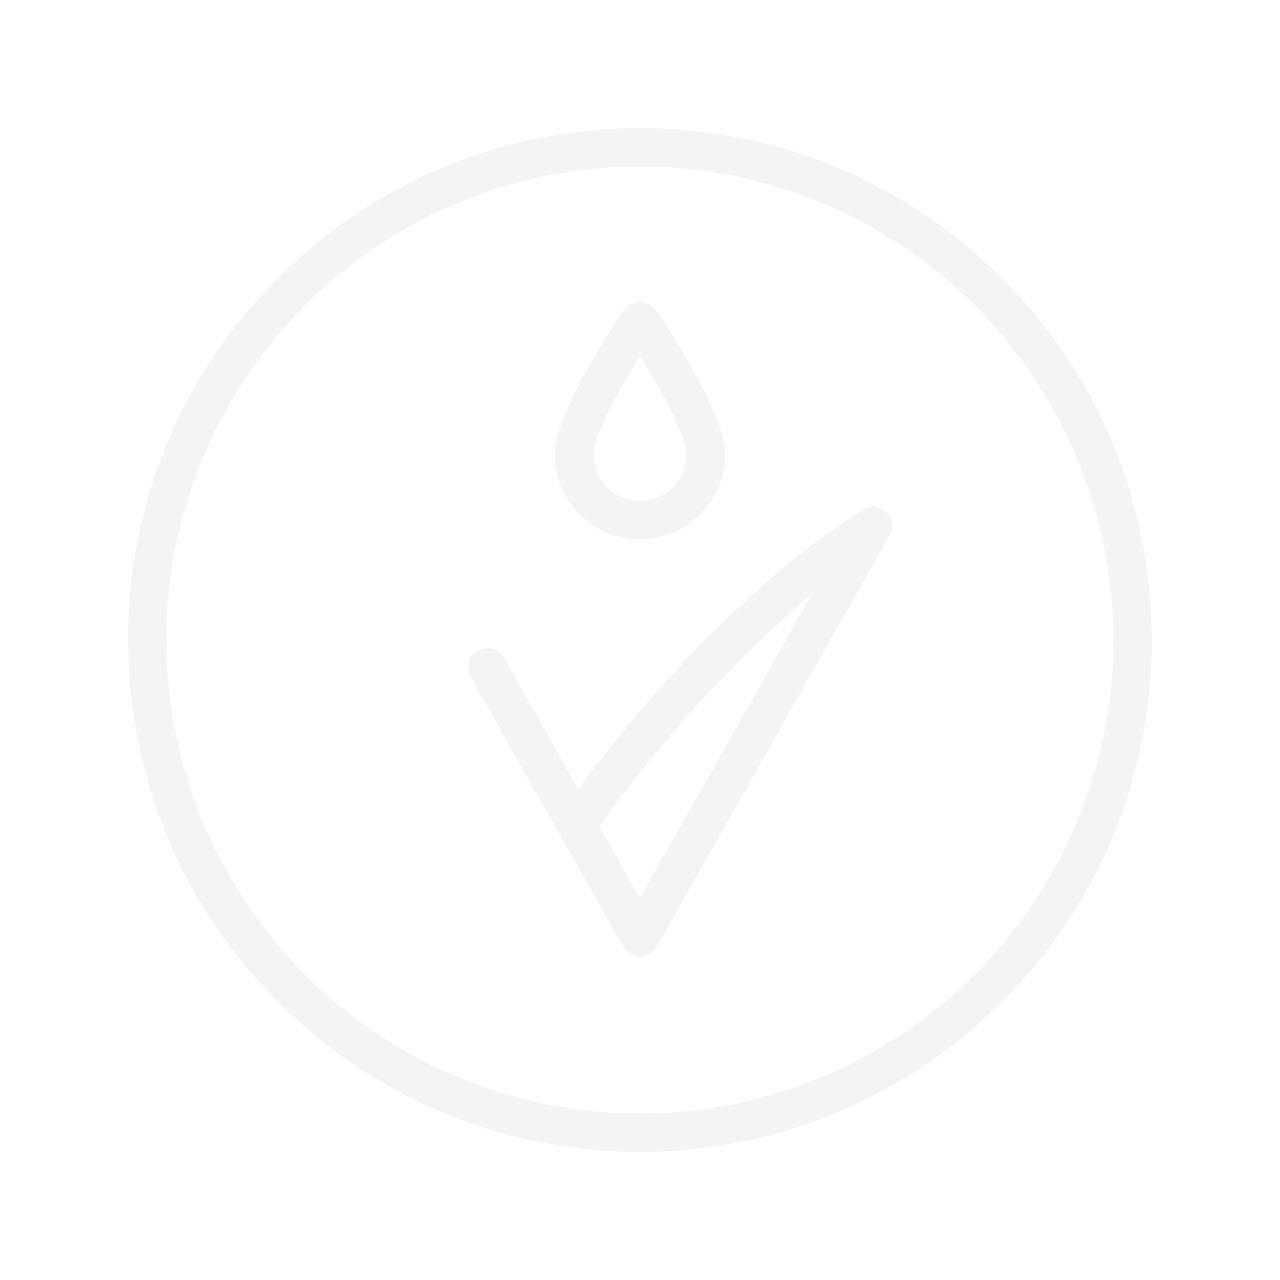 MILANI Eyeshadow Palette 12g